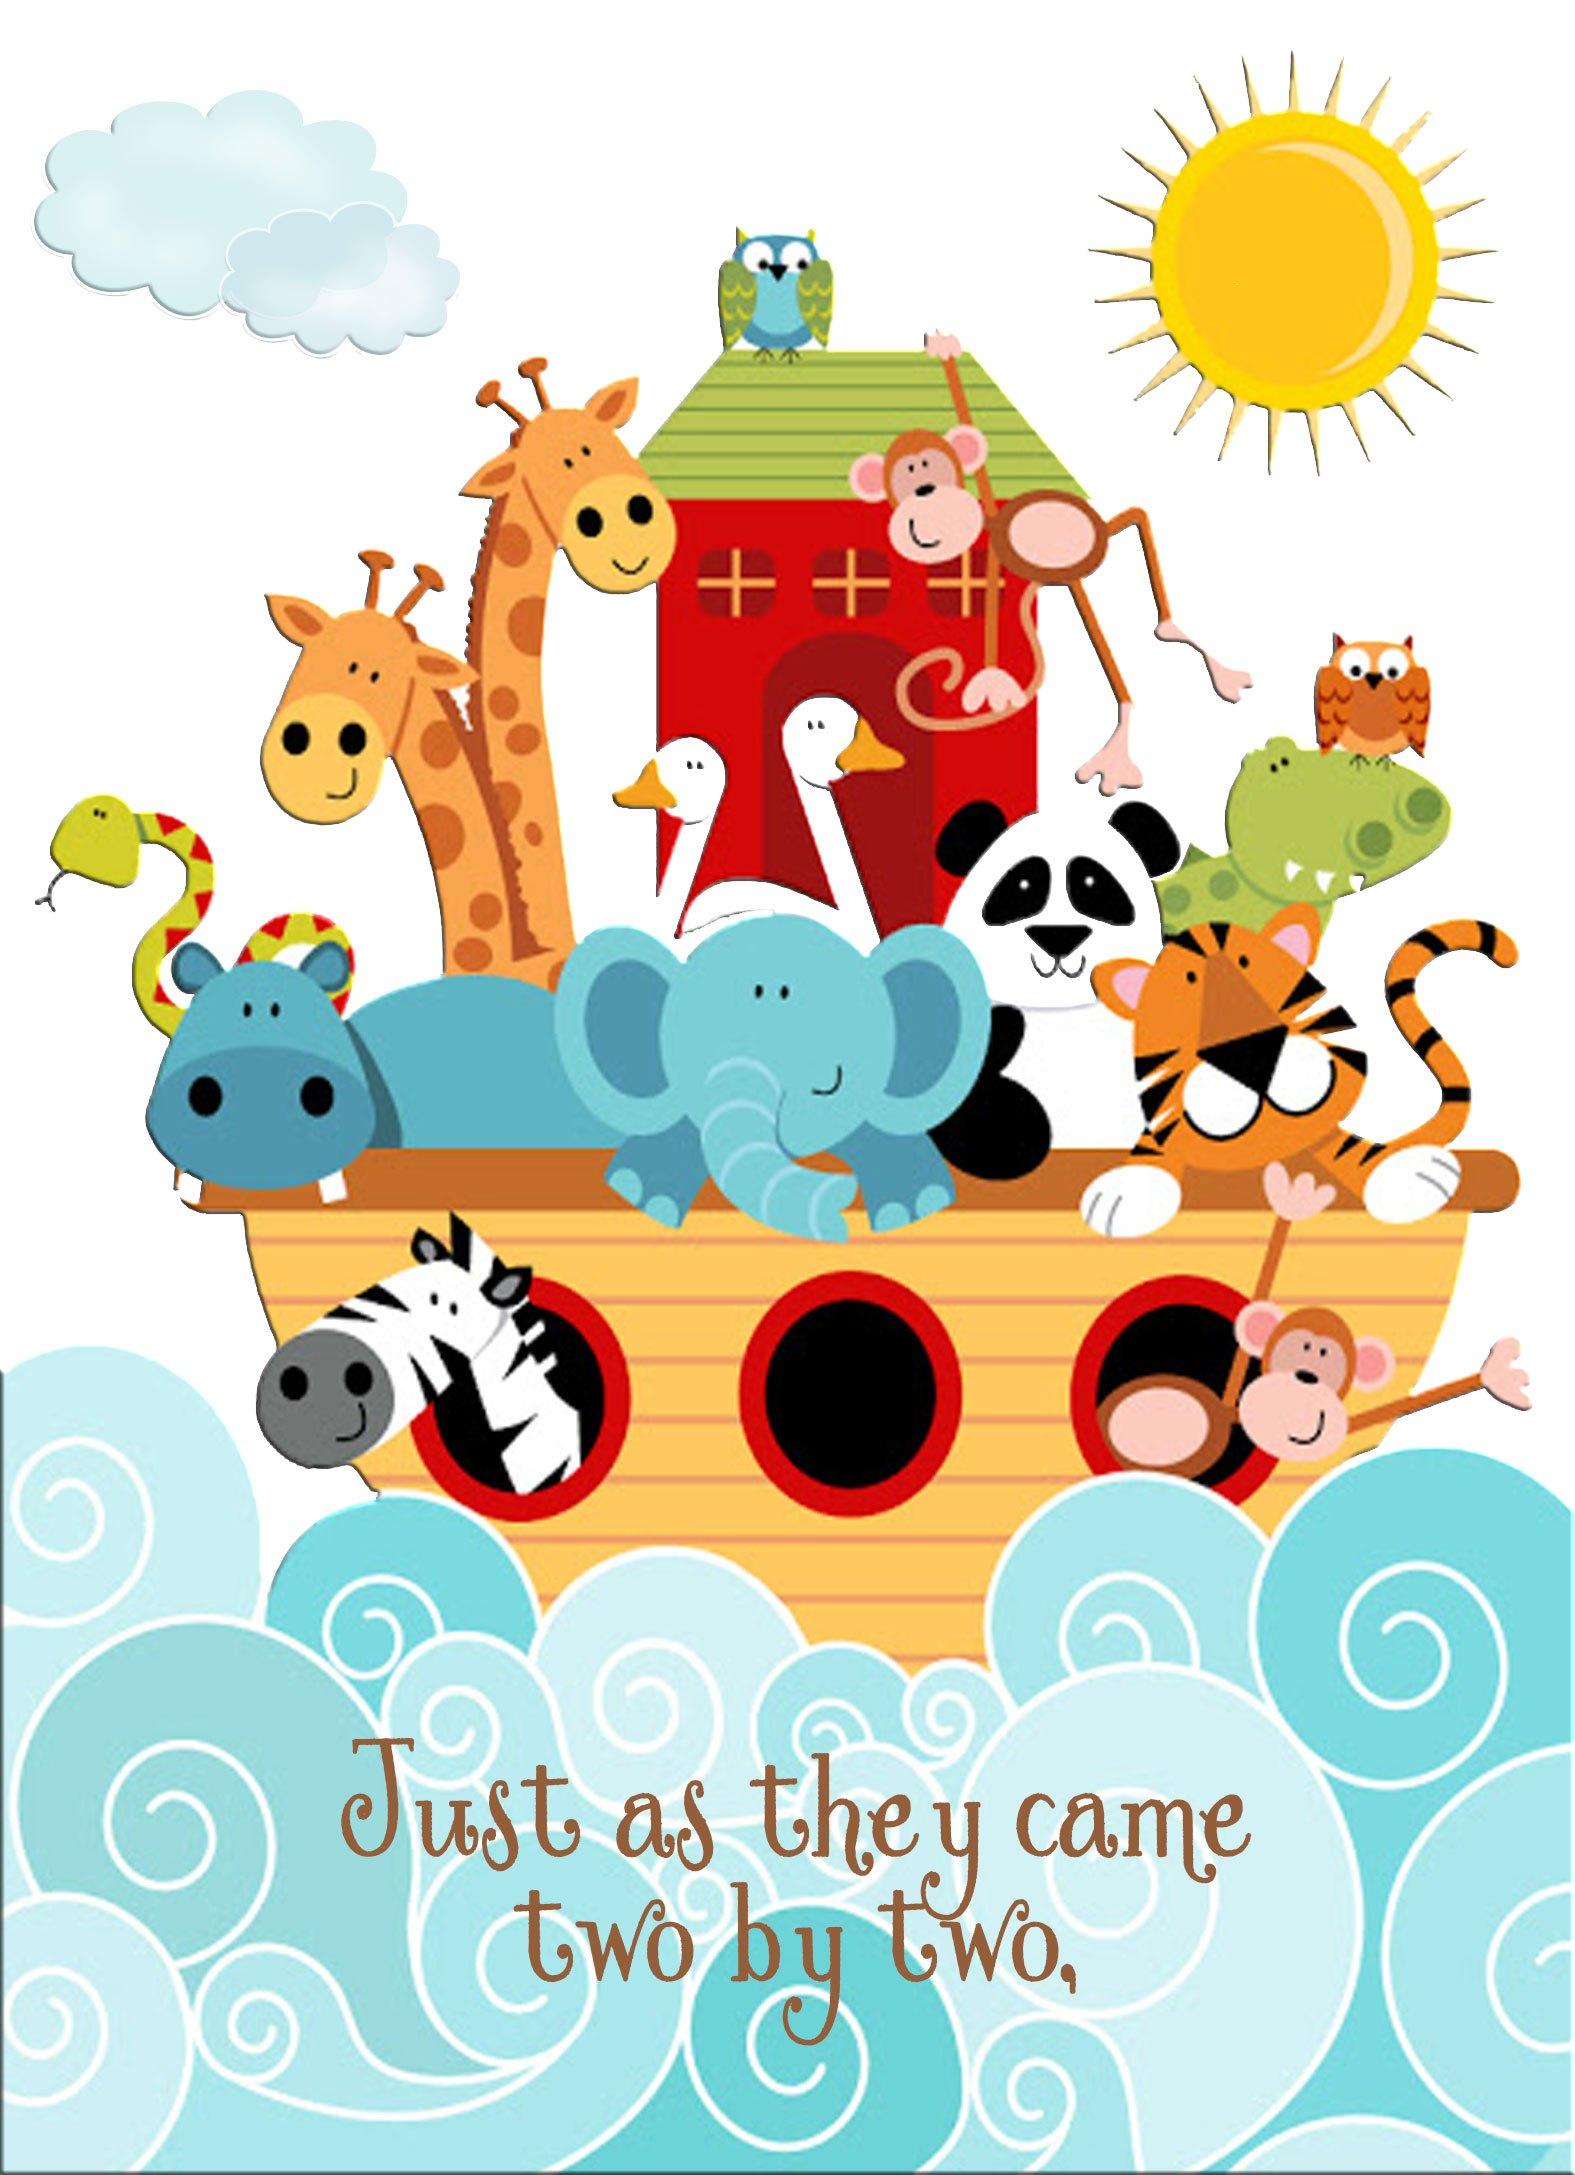 Noahs ark baby shower clipart 8 » Clipart Portal.